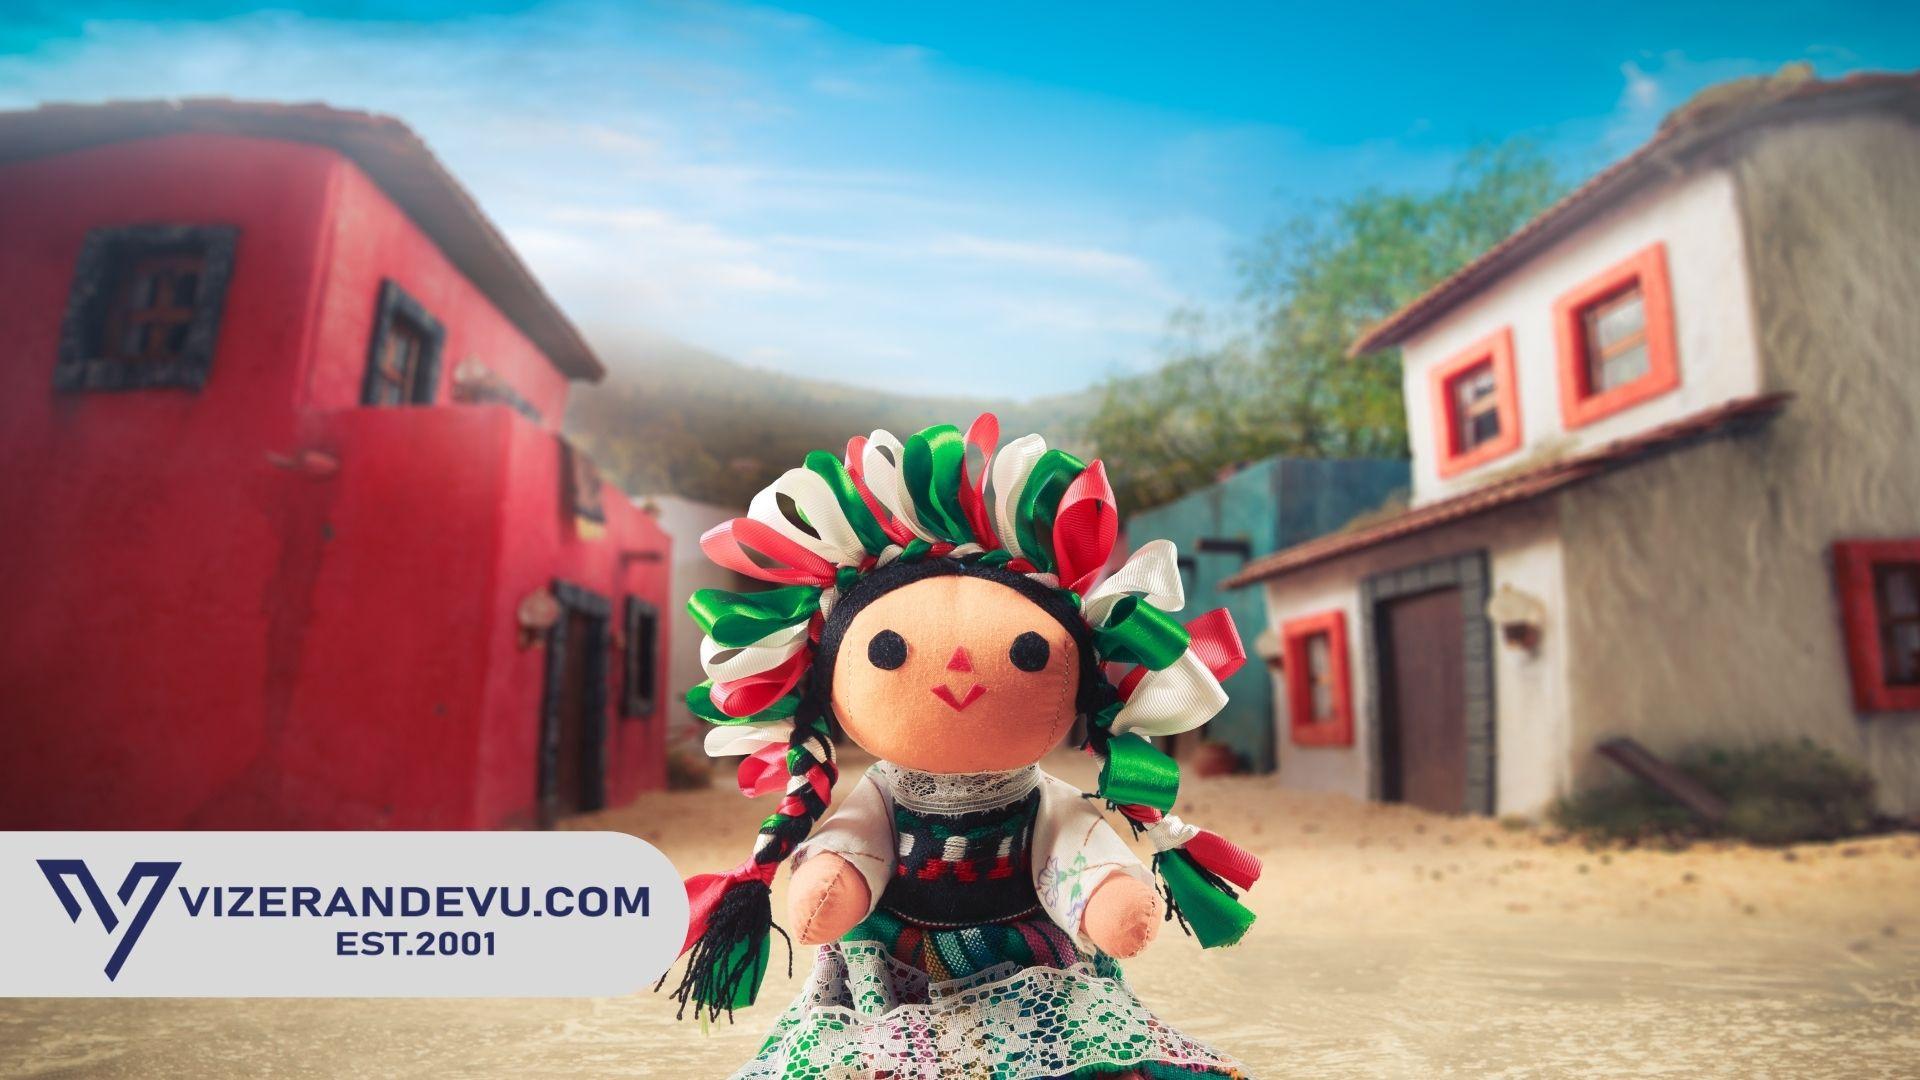 Meksika Turist Vizesi Nedir?